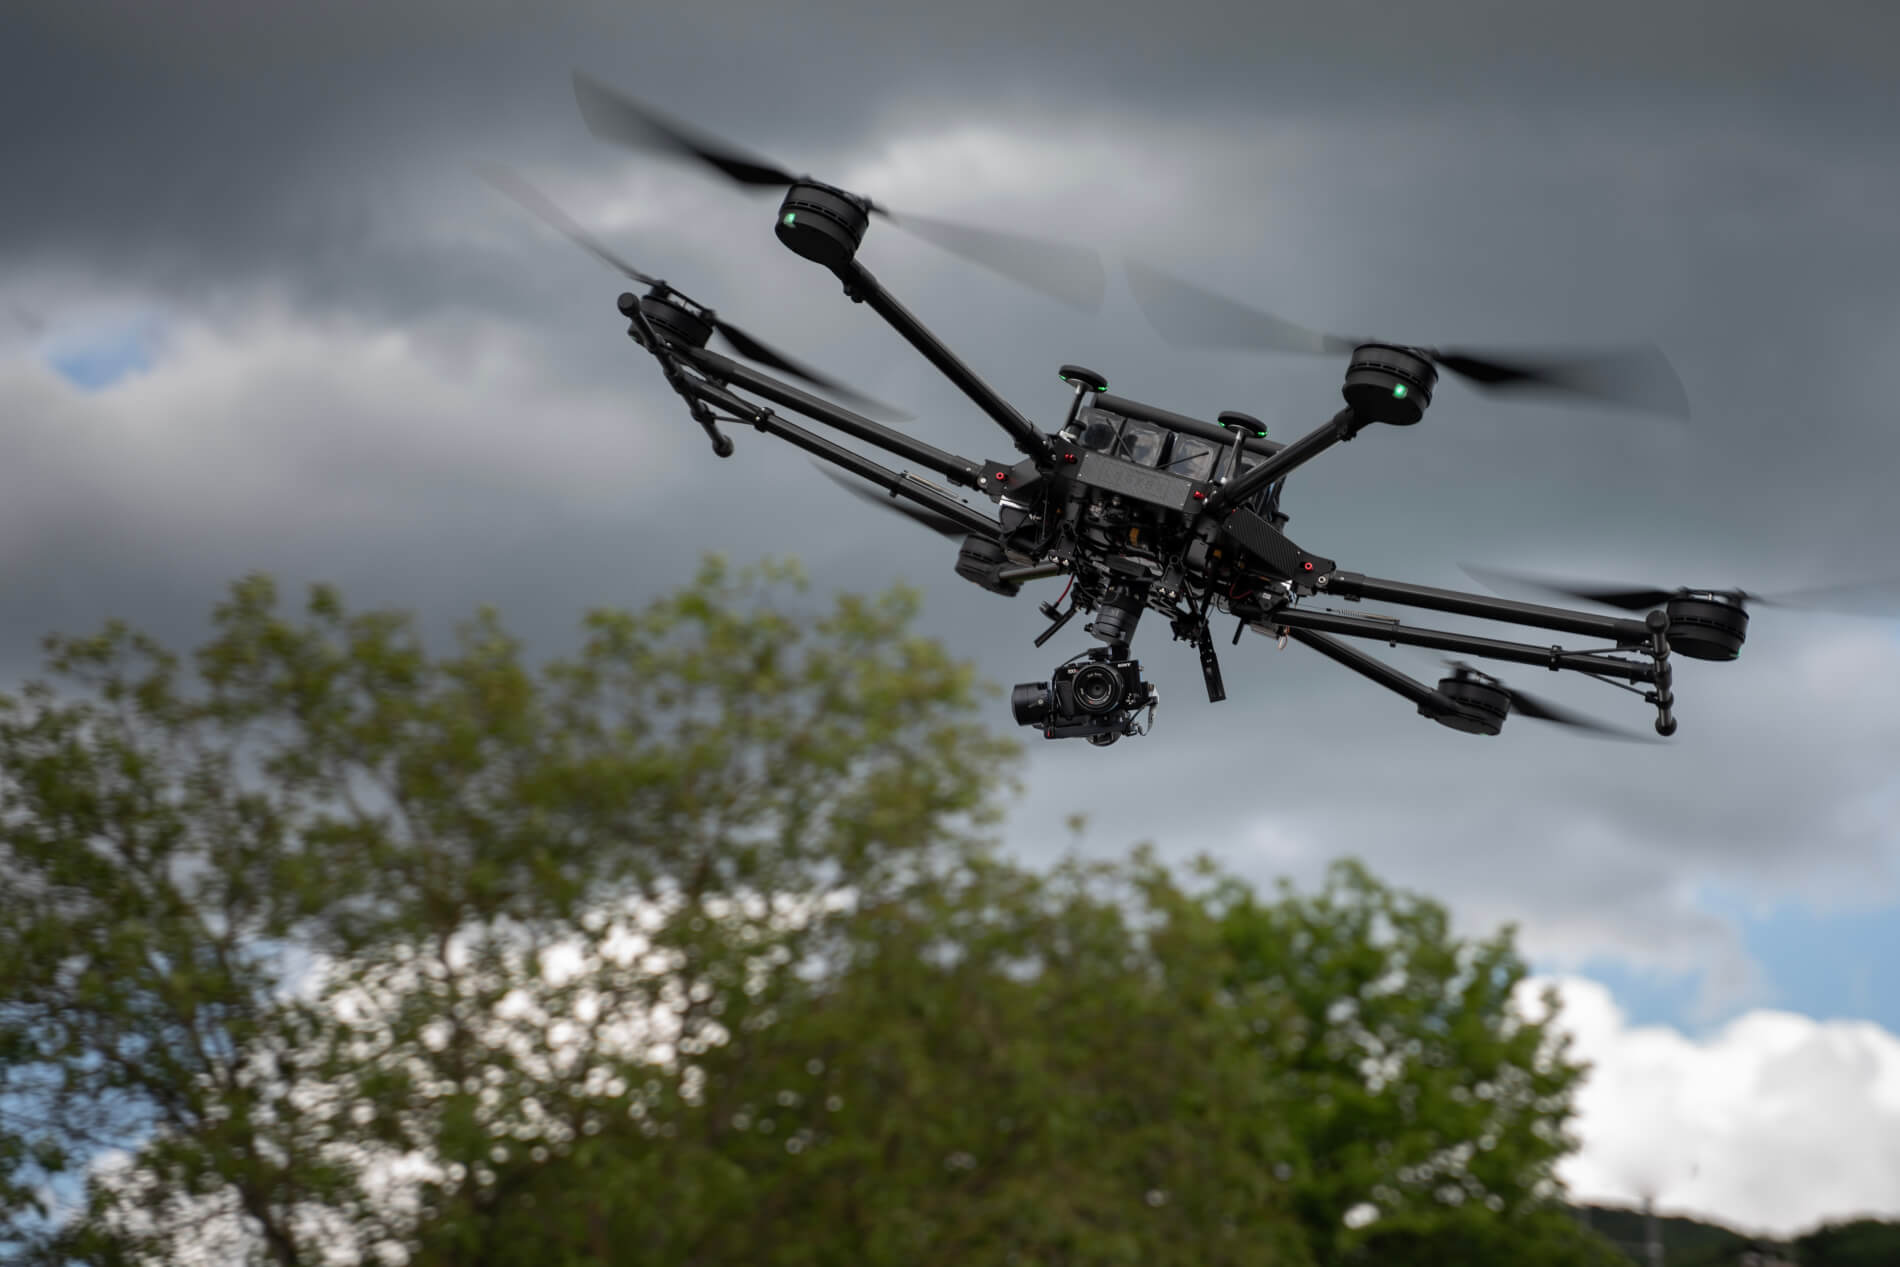 Photogrammetrie-Service-Drohne-3D-Scanning-Logxon-photogrammetrie-lidar-scanner-sensor-gimbal-sony-kamera-porter-drohne-uav-performance-schräglage-aircraft